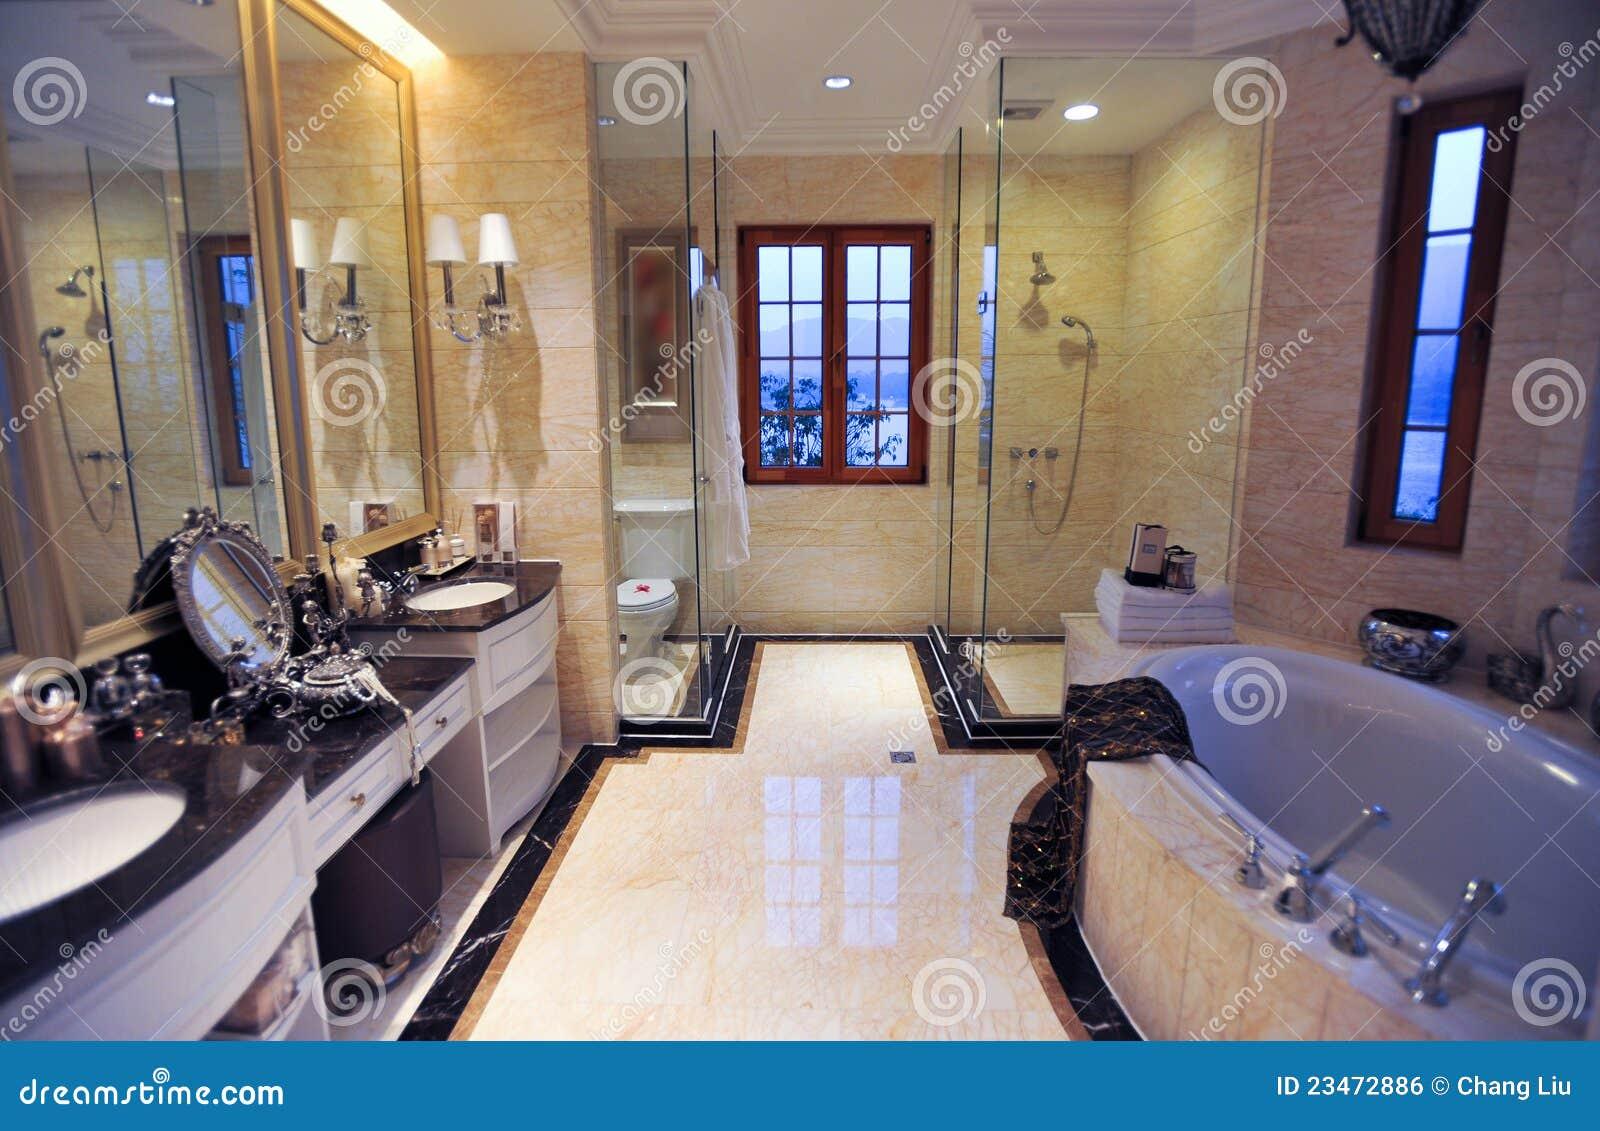 marble bathtub dark table modern design big mr no pr no 4 3025 13 #8B7040 1300x936 Amarelo No Banheiro